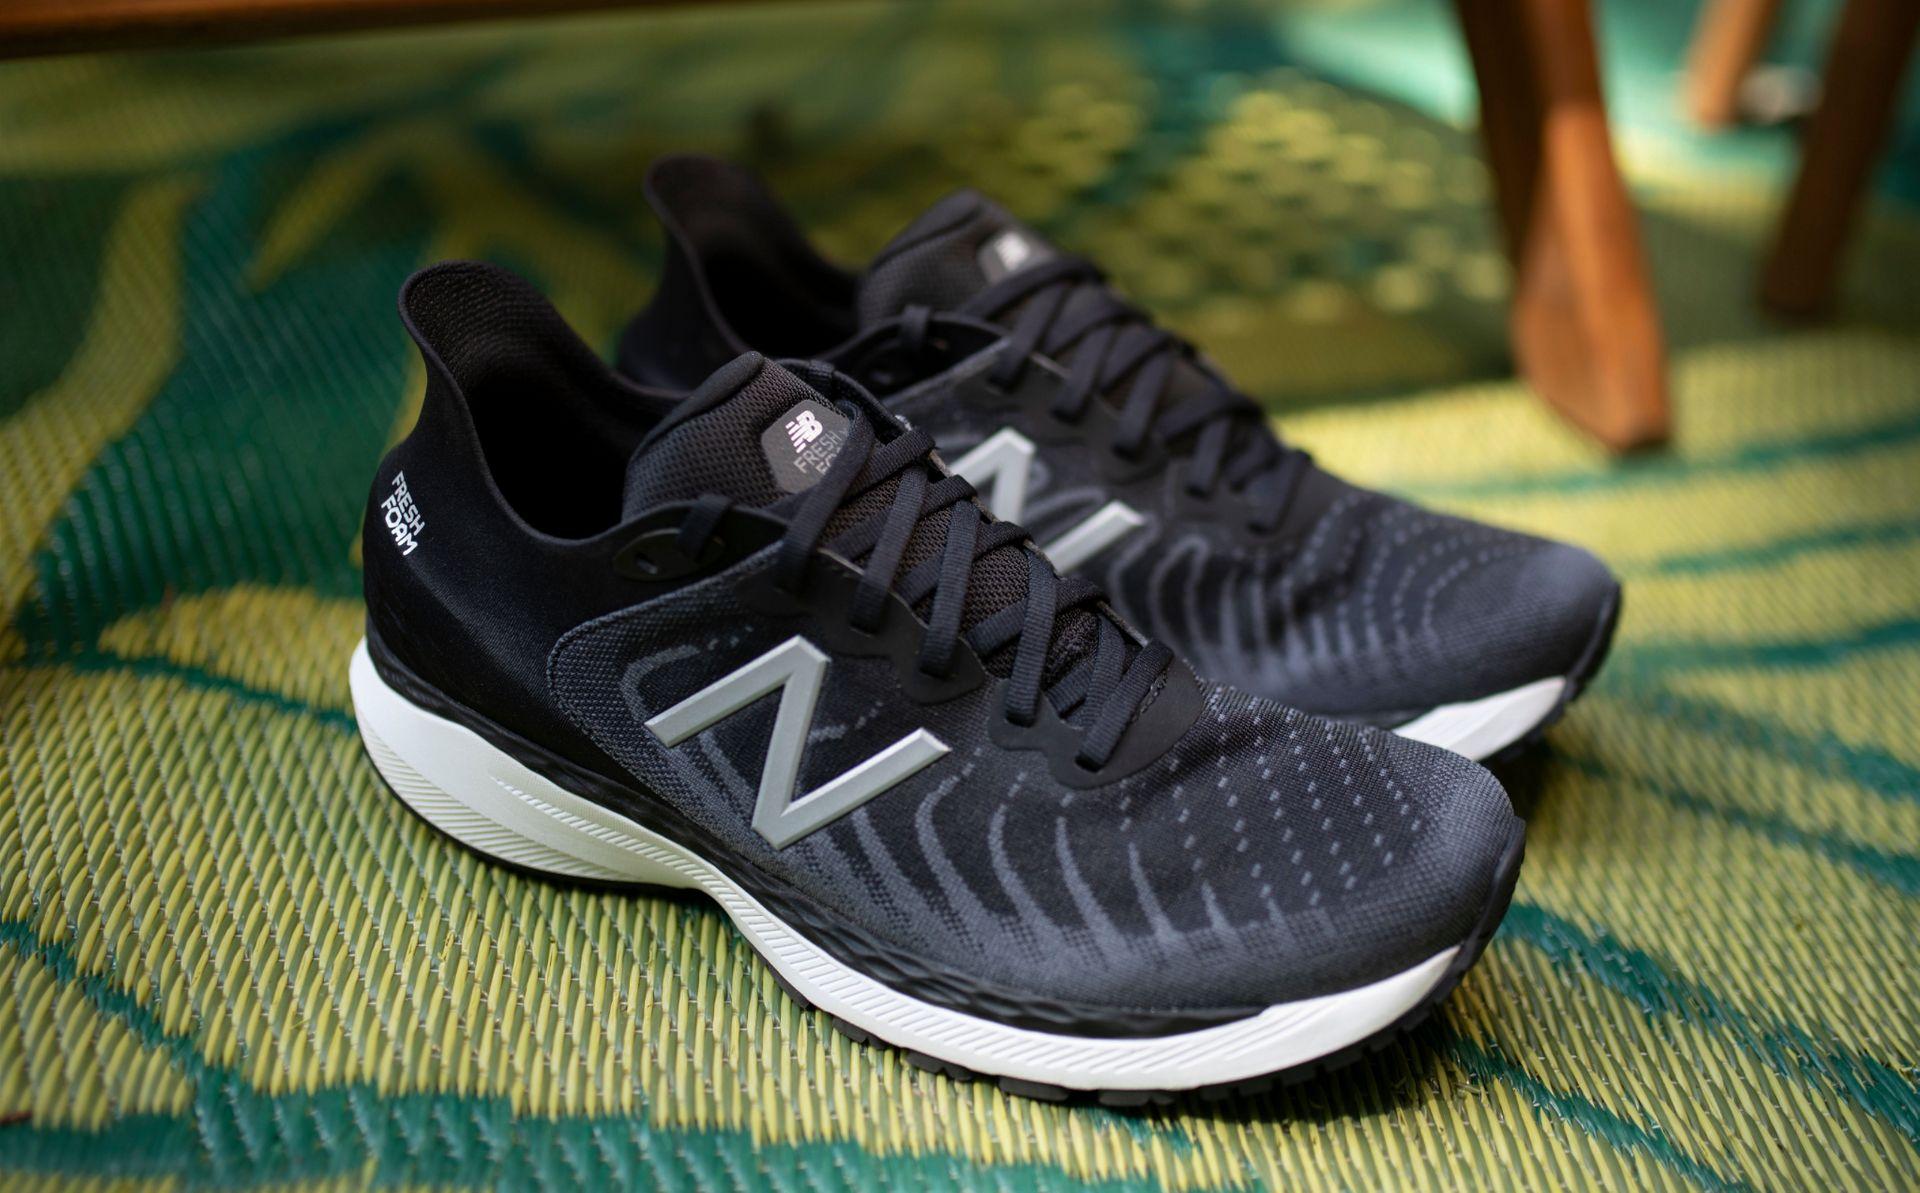 Camello Tarjeta postal Posada  Best Stability Running Shoes 2020 | Buyer's Guide